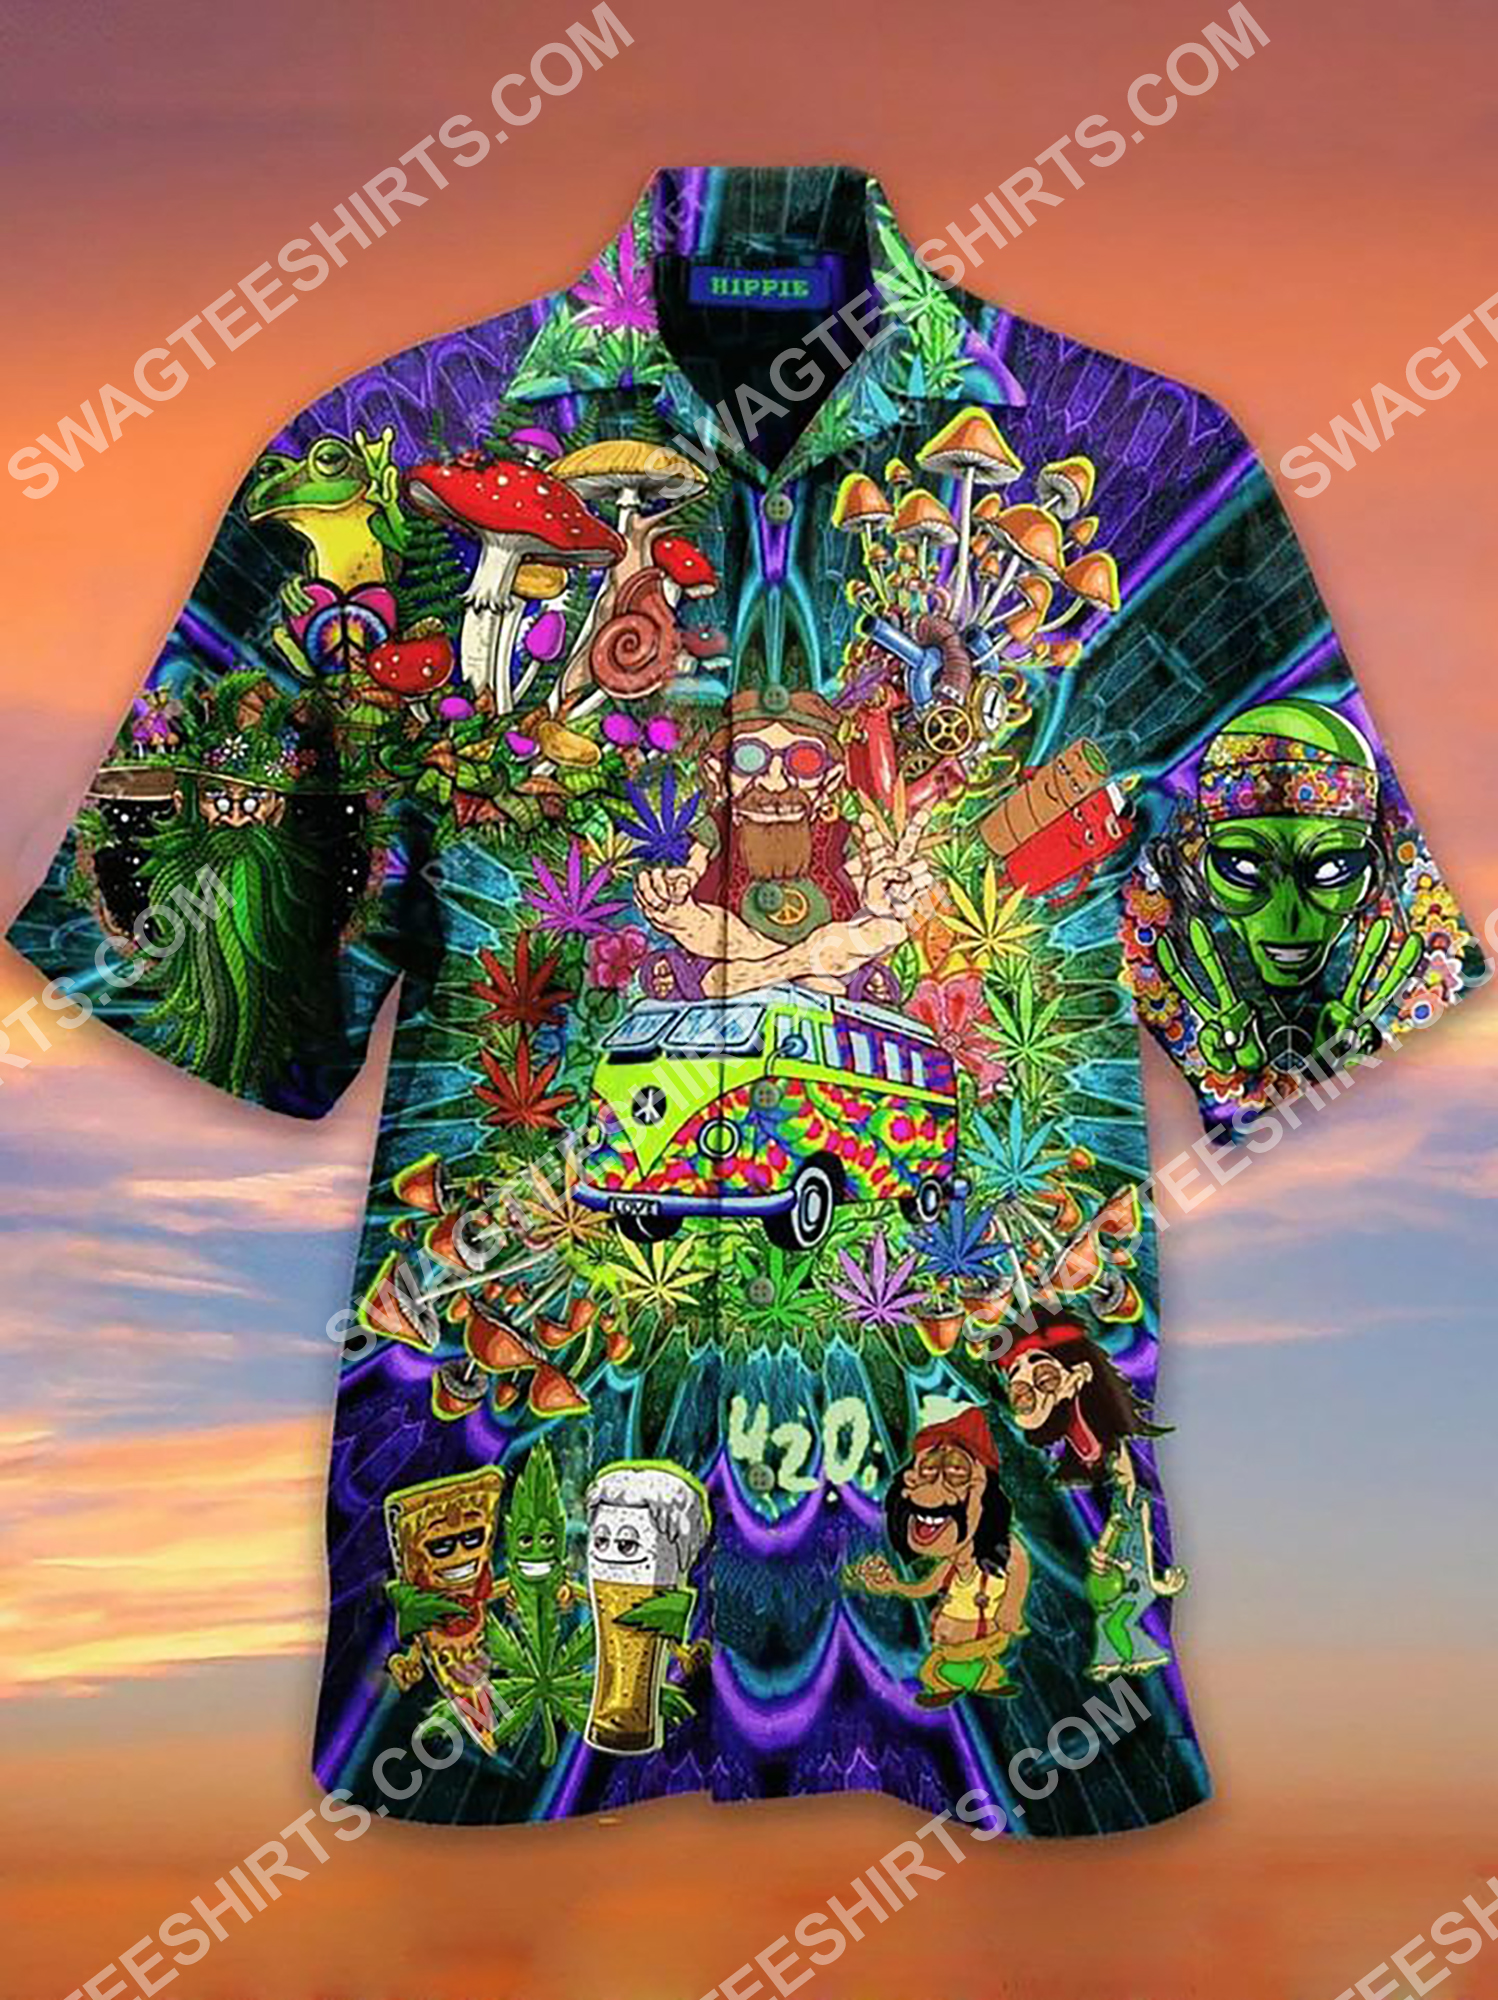 [Top-selling] hippie mushroom all over printing hawaiian shirt - maria